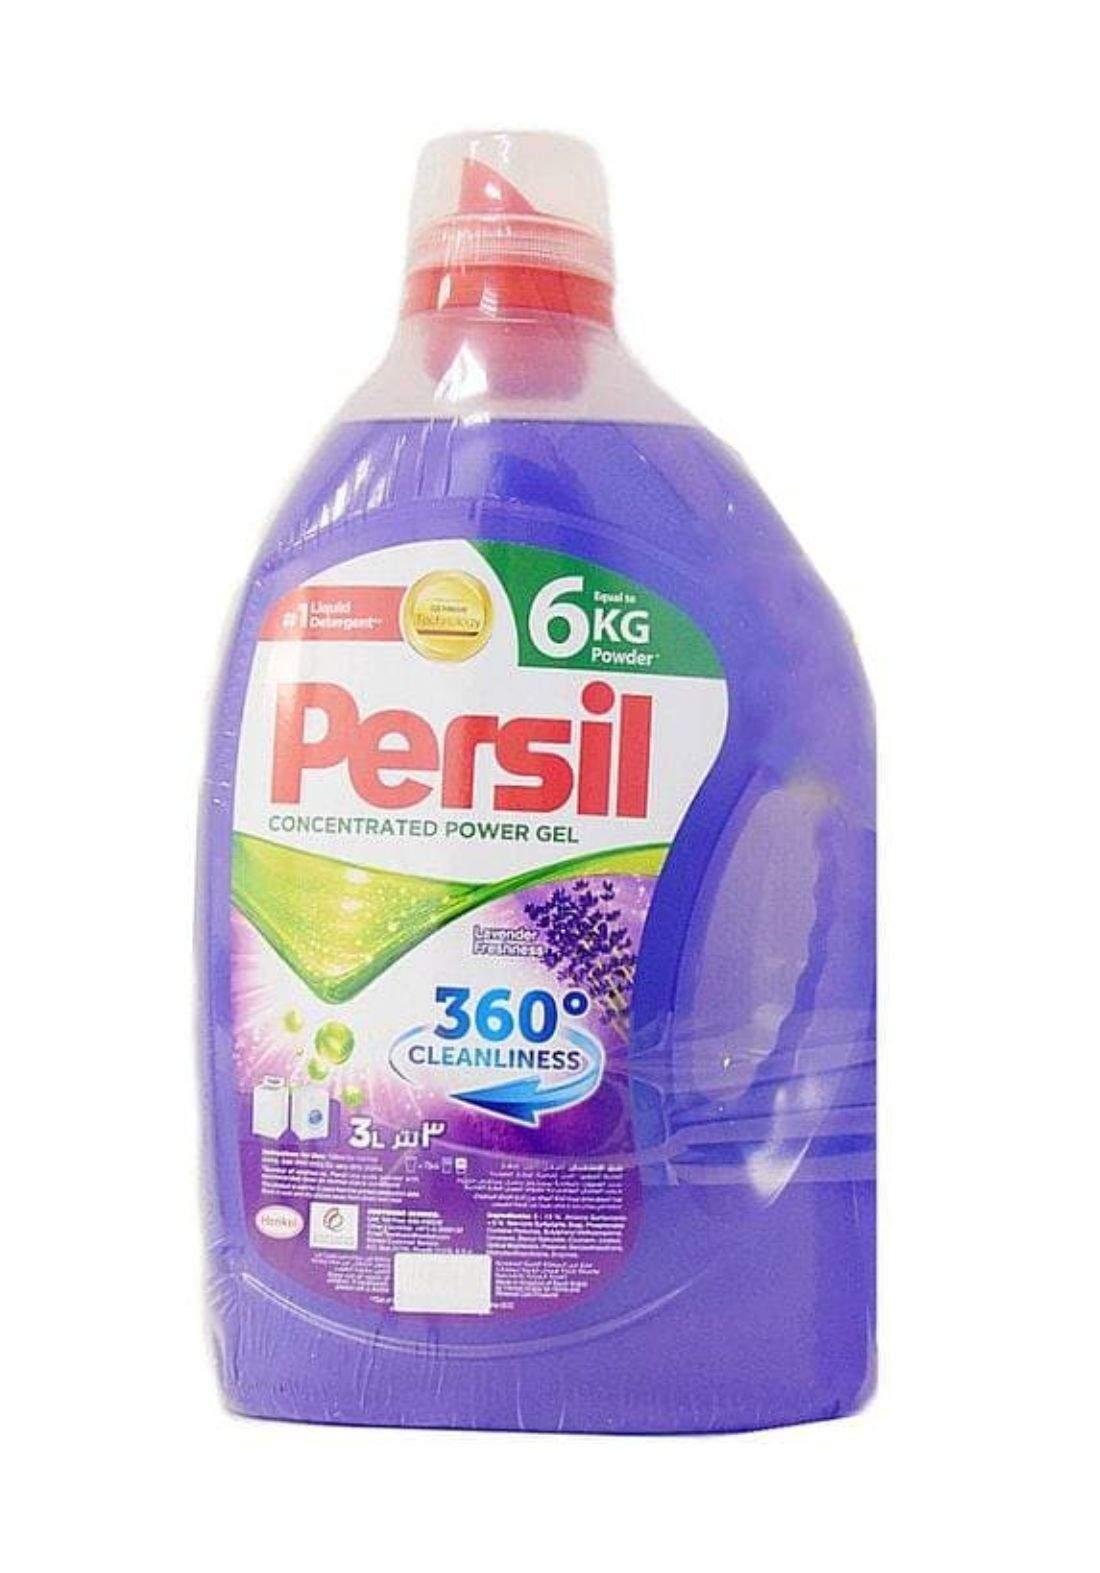 Persil concentrated power gel 3L جل برسيل المركّز 3 لتر